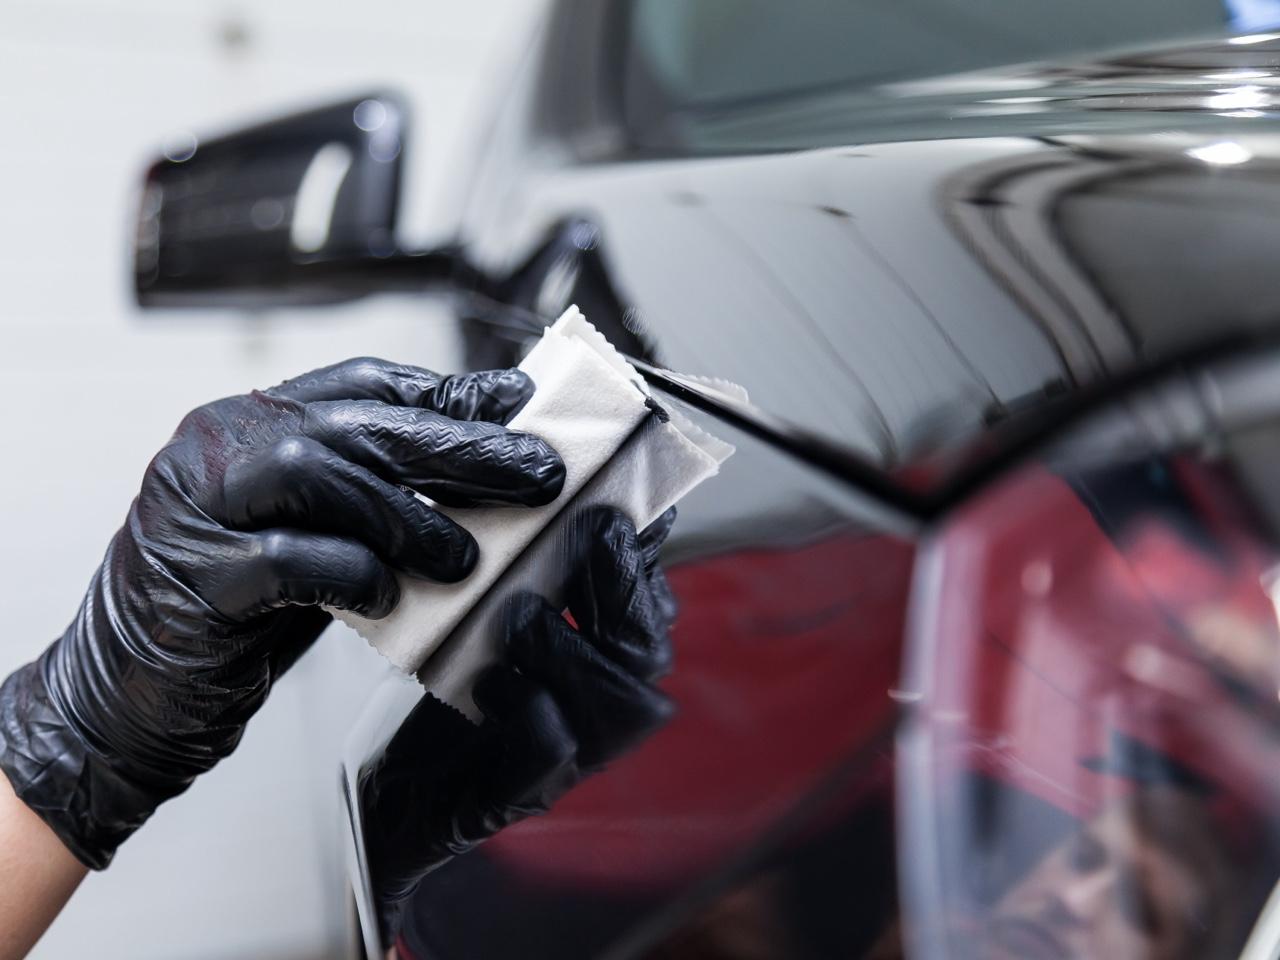 applying ceramic coating to a black car